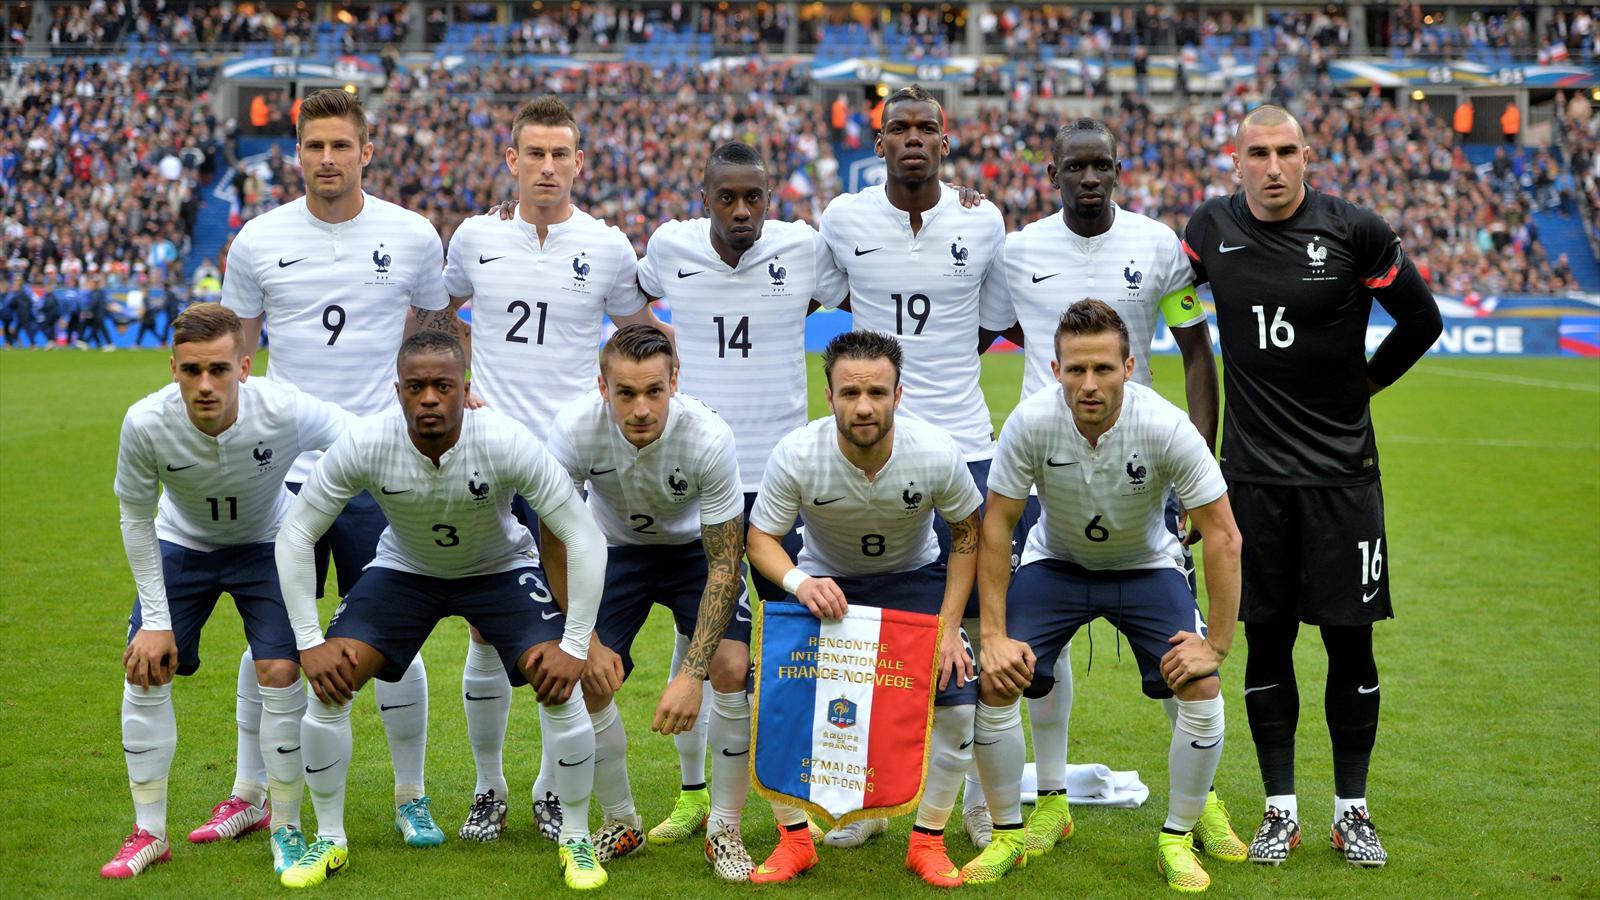 Classement fifa la france tombe la 17e place le - Resultat foot coupe europe ...